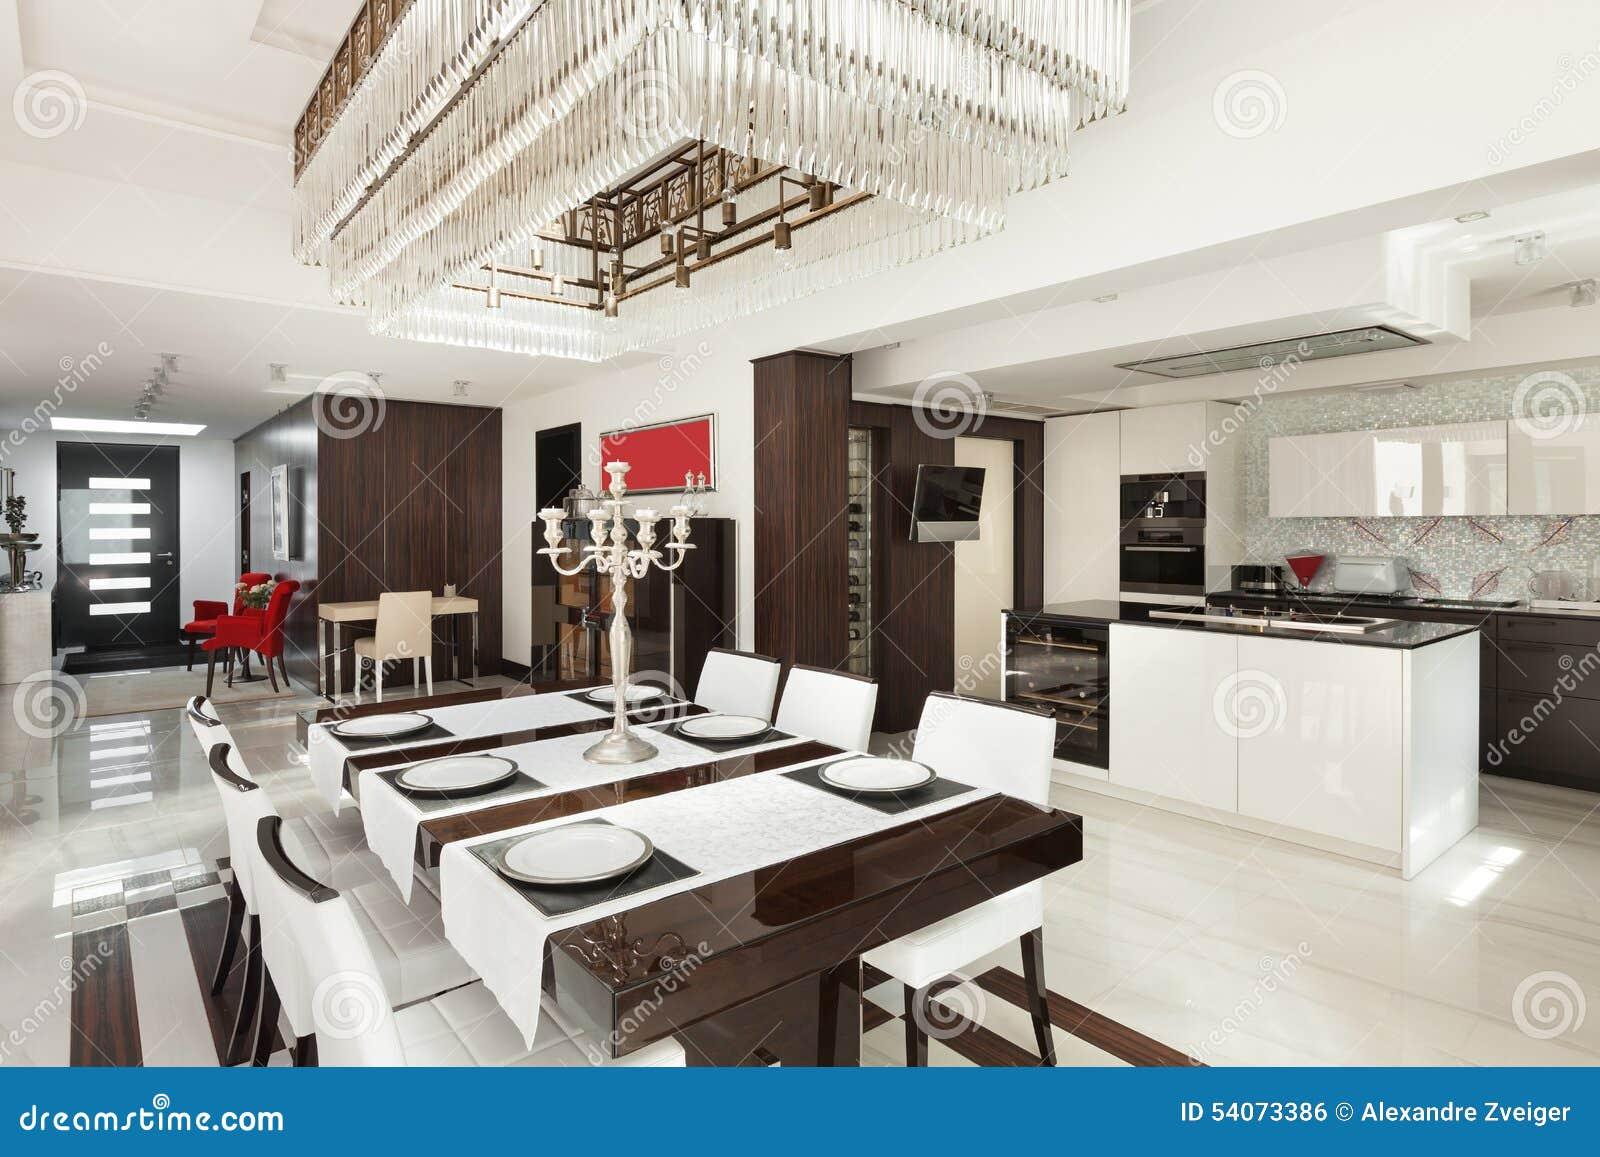 Interiores sala de jantar luxuosa foto de stock imagem for Interiores de salas